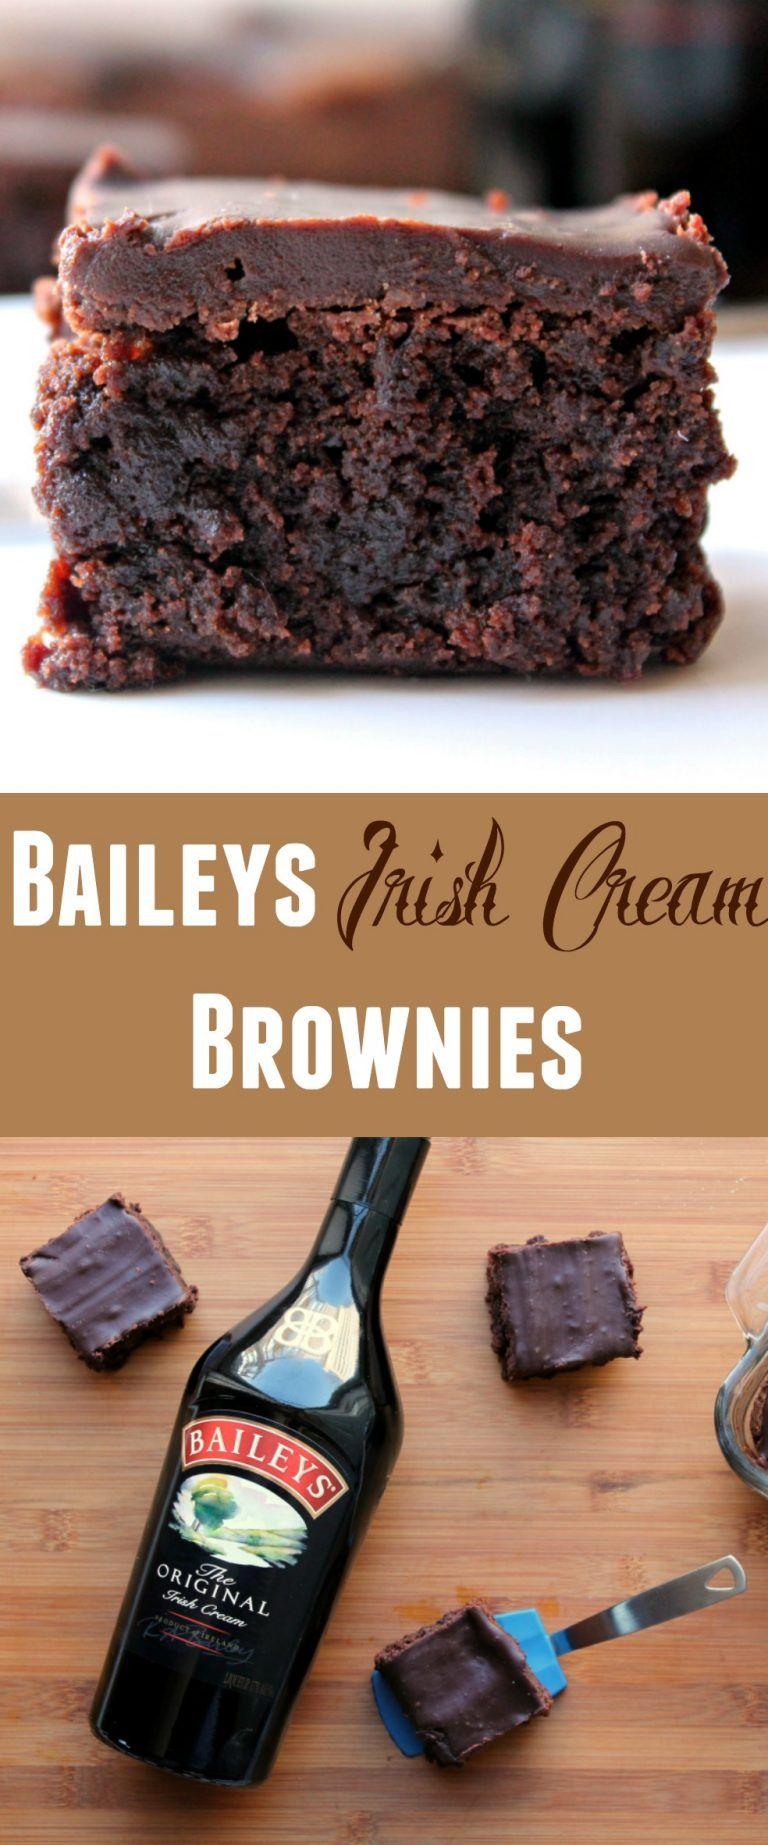 Photo of Baileys Irish Cream Brownies – Foody Schmoody Blog